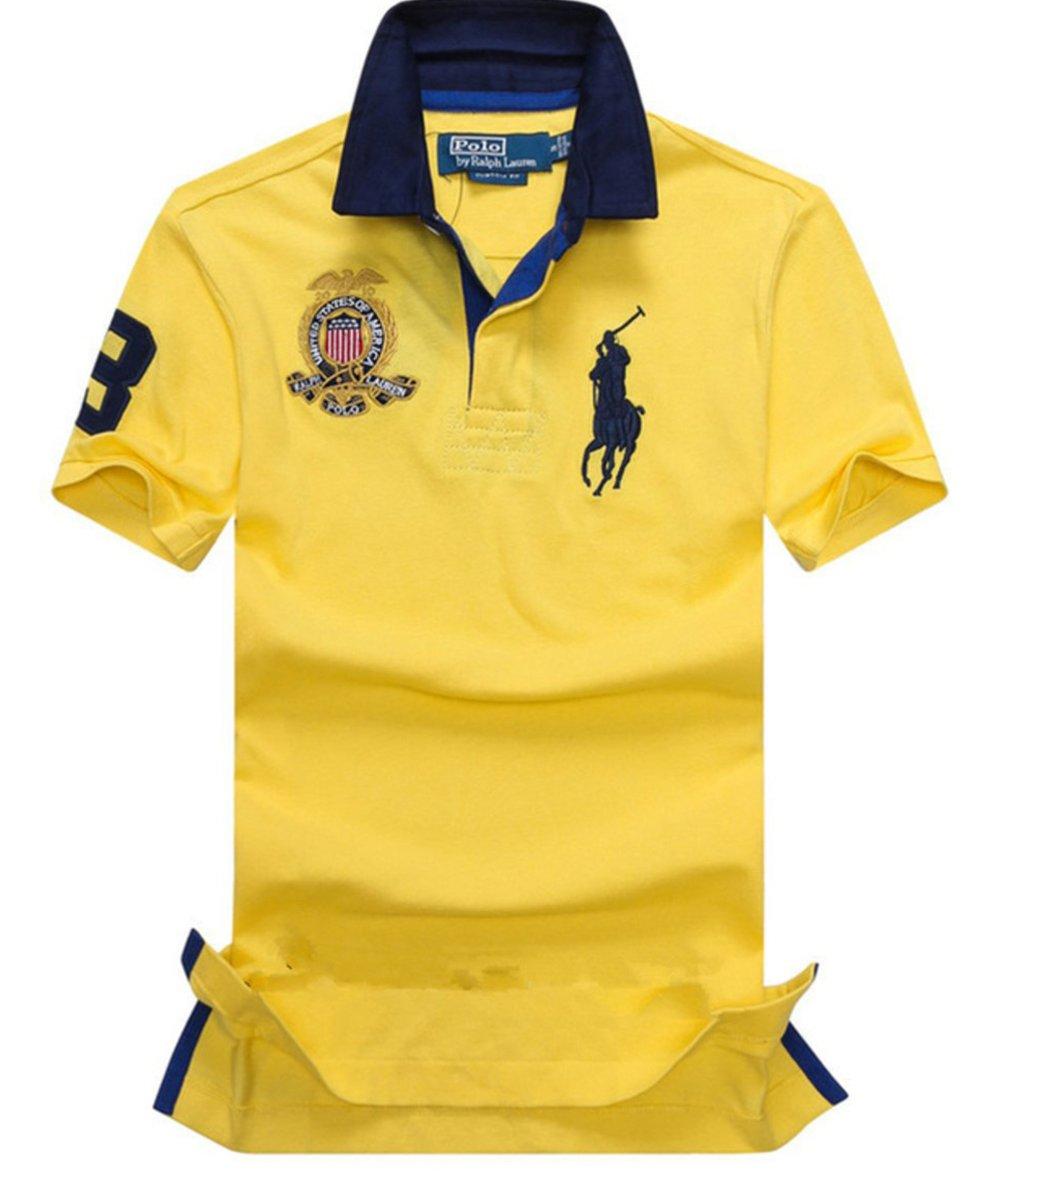 Мужская желтая футболка поло Ralph Lauren R5